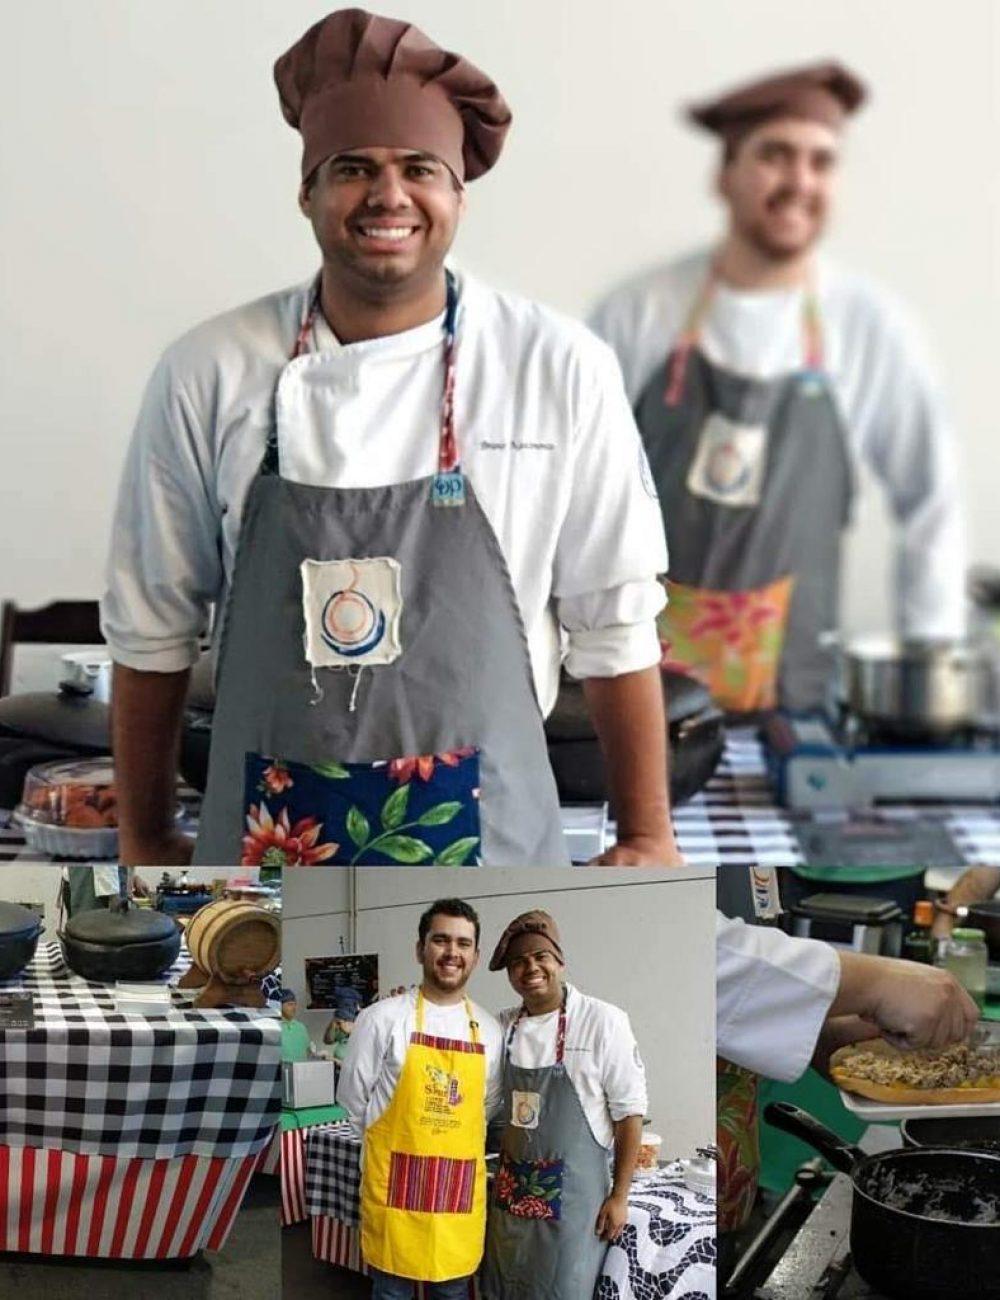 alunos curso Gastronomia participando da feira gastrnômica e cultural da UFRJ2